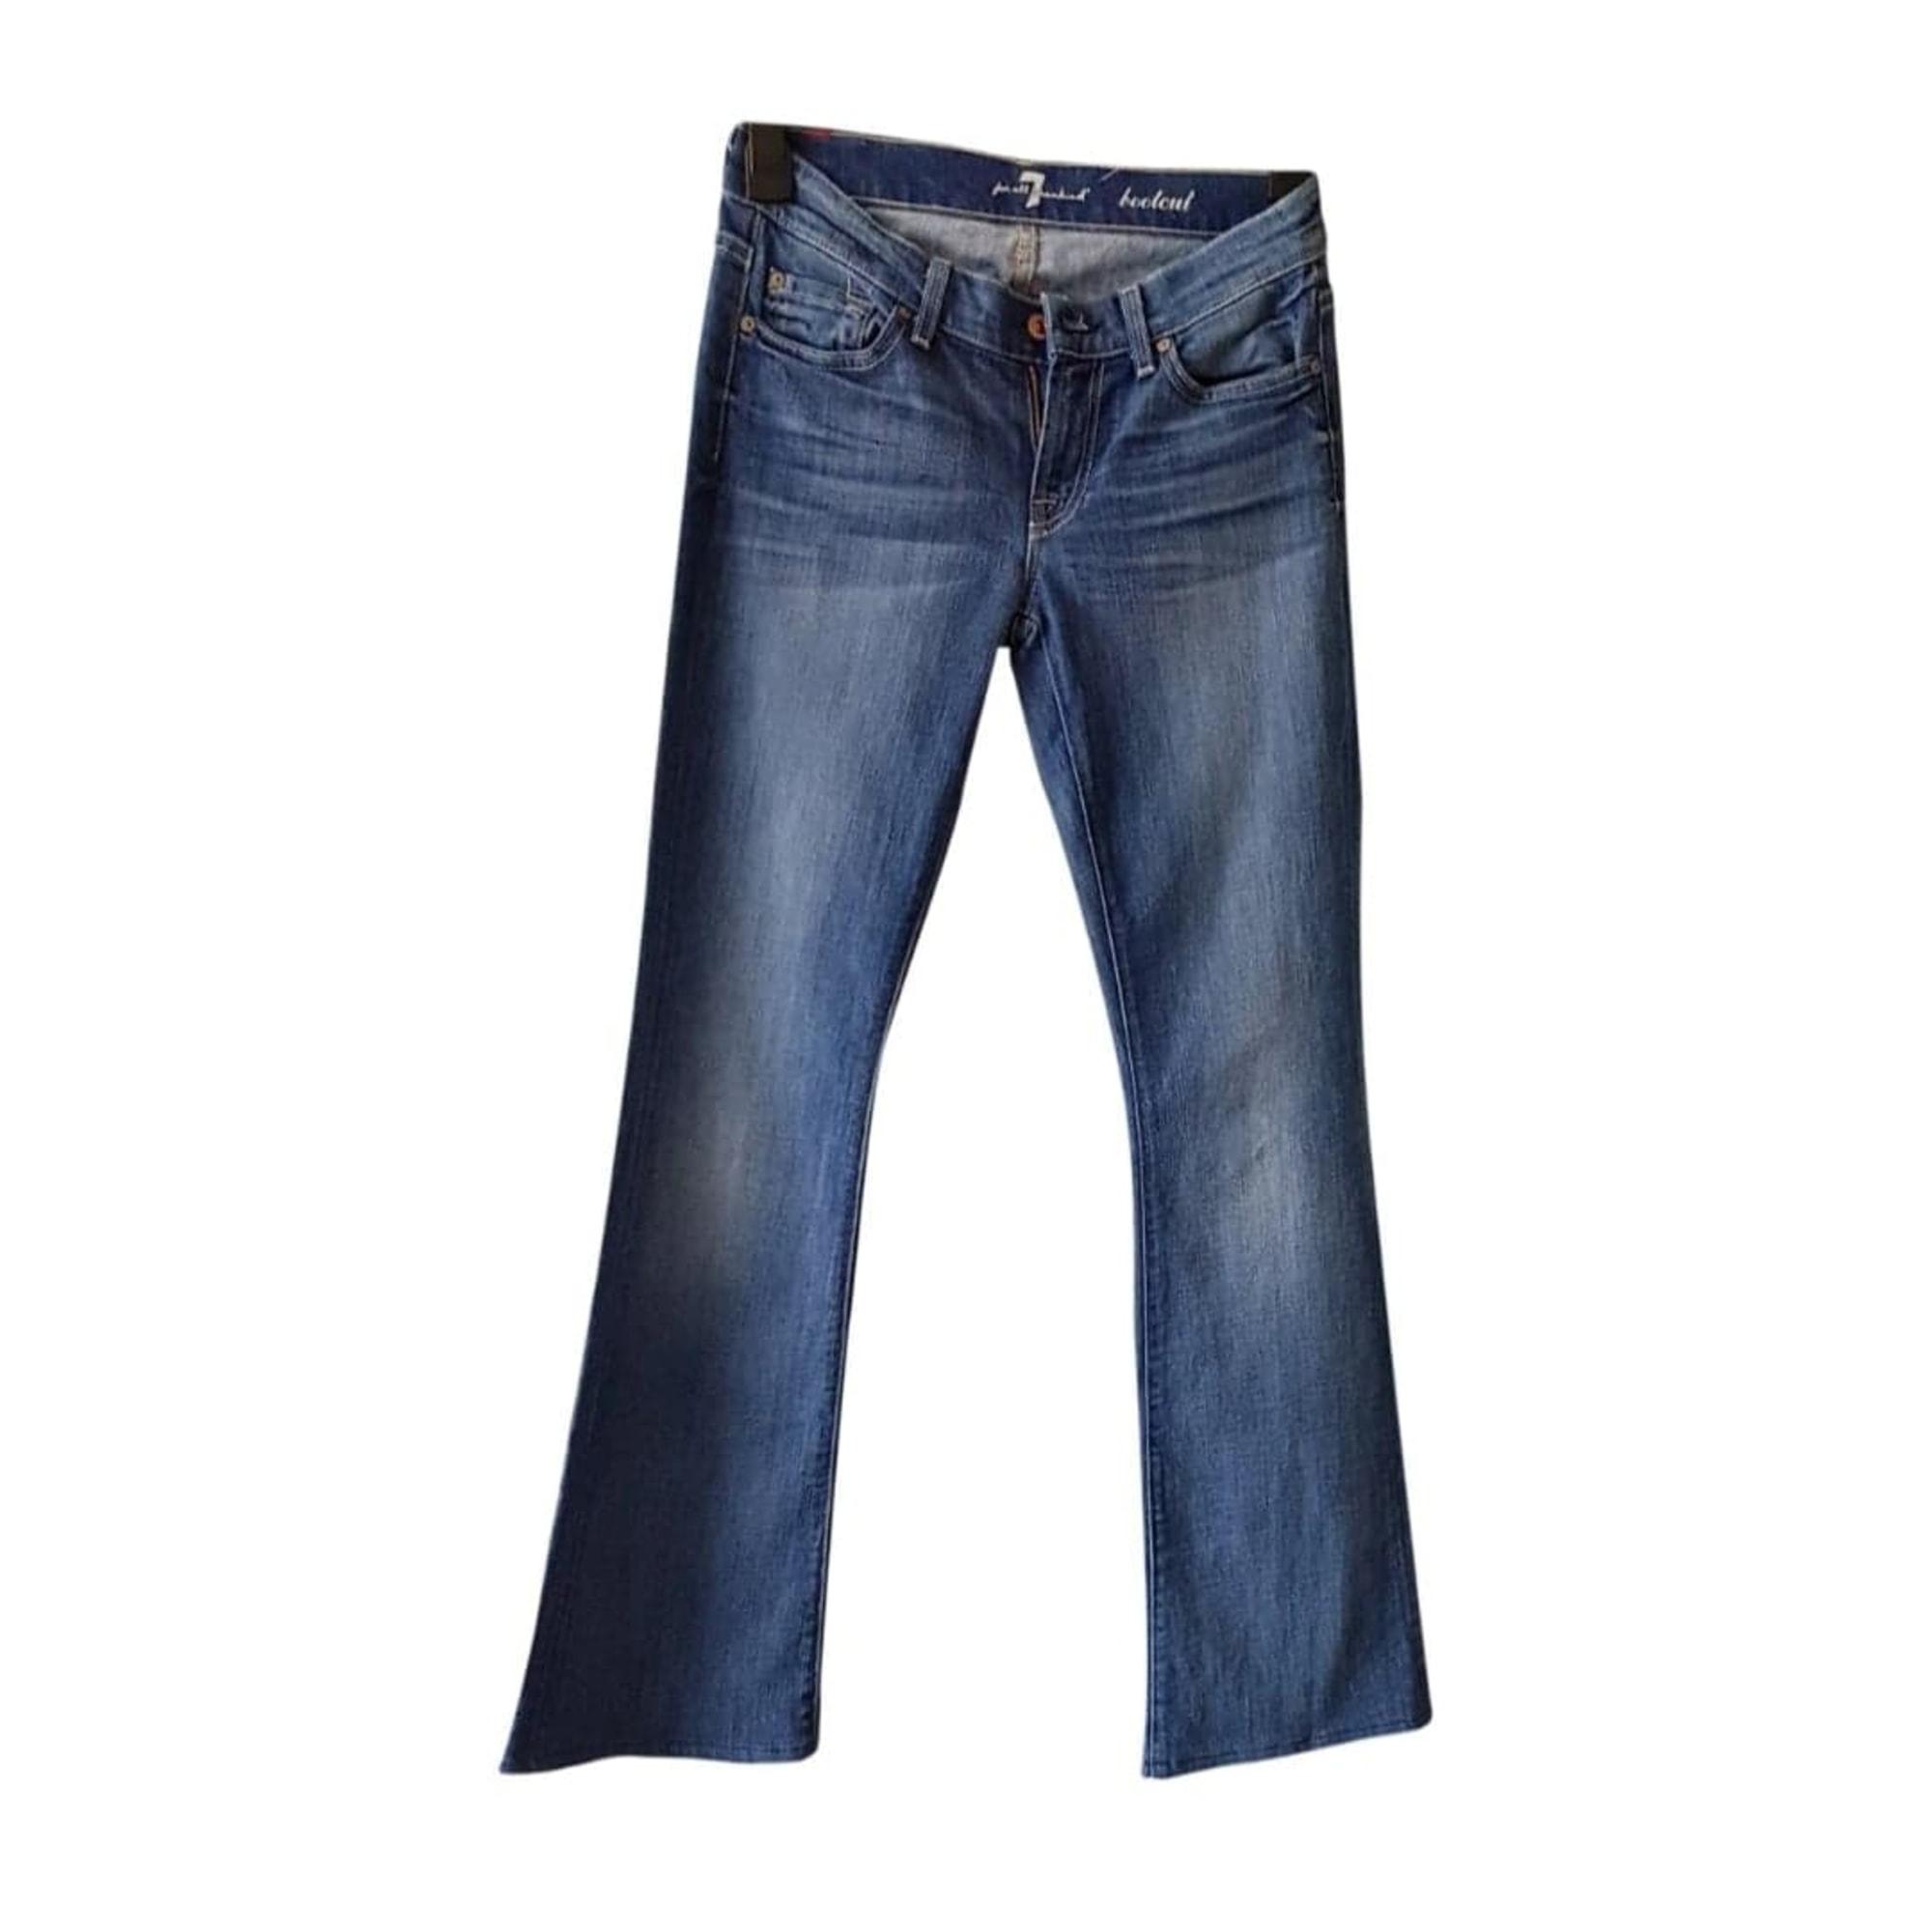 Jeans large, boyfriend 7 FOR ALL MANKIND Bleu, bleu marine, bleu turquoise